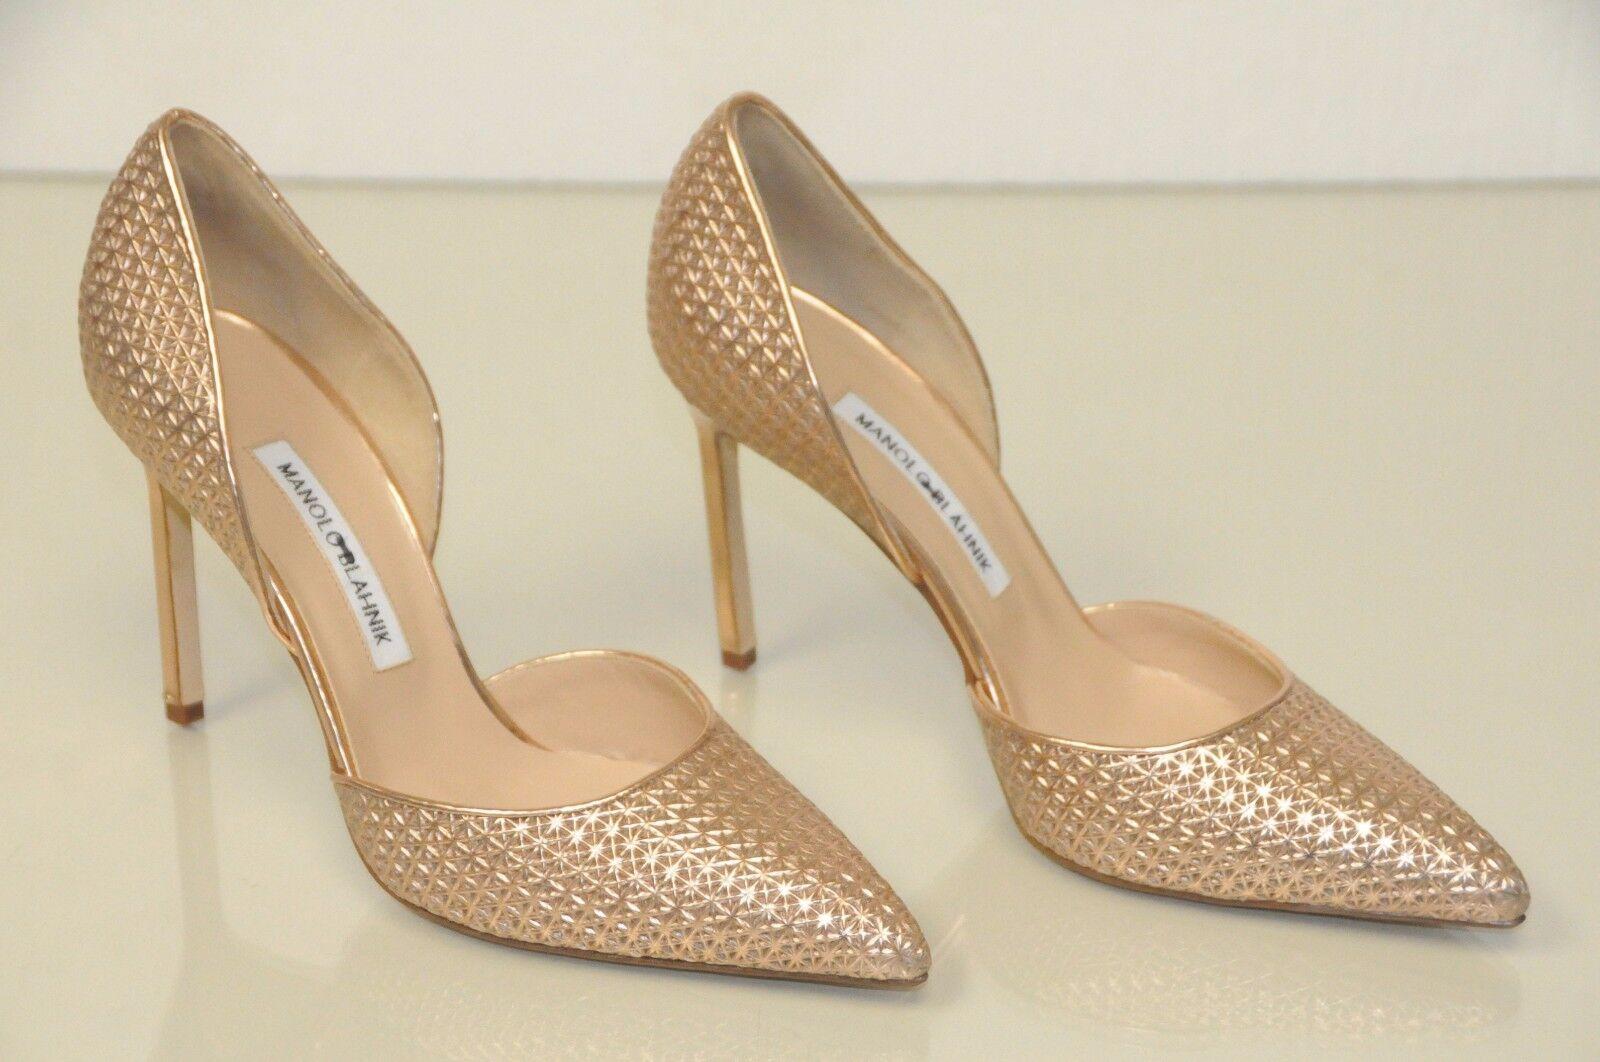 New New New Manolo Blahnik Tayler rose Rose or Metallic Pump Dorsay chaussures 39.5 40.5 e75202